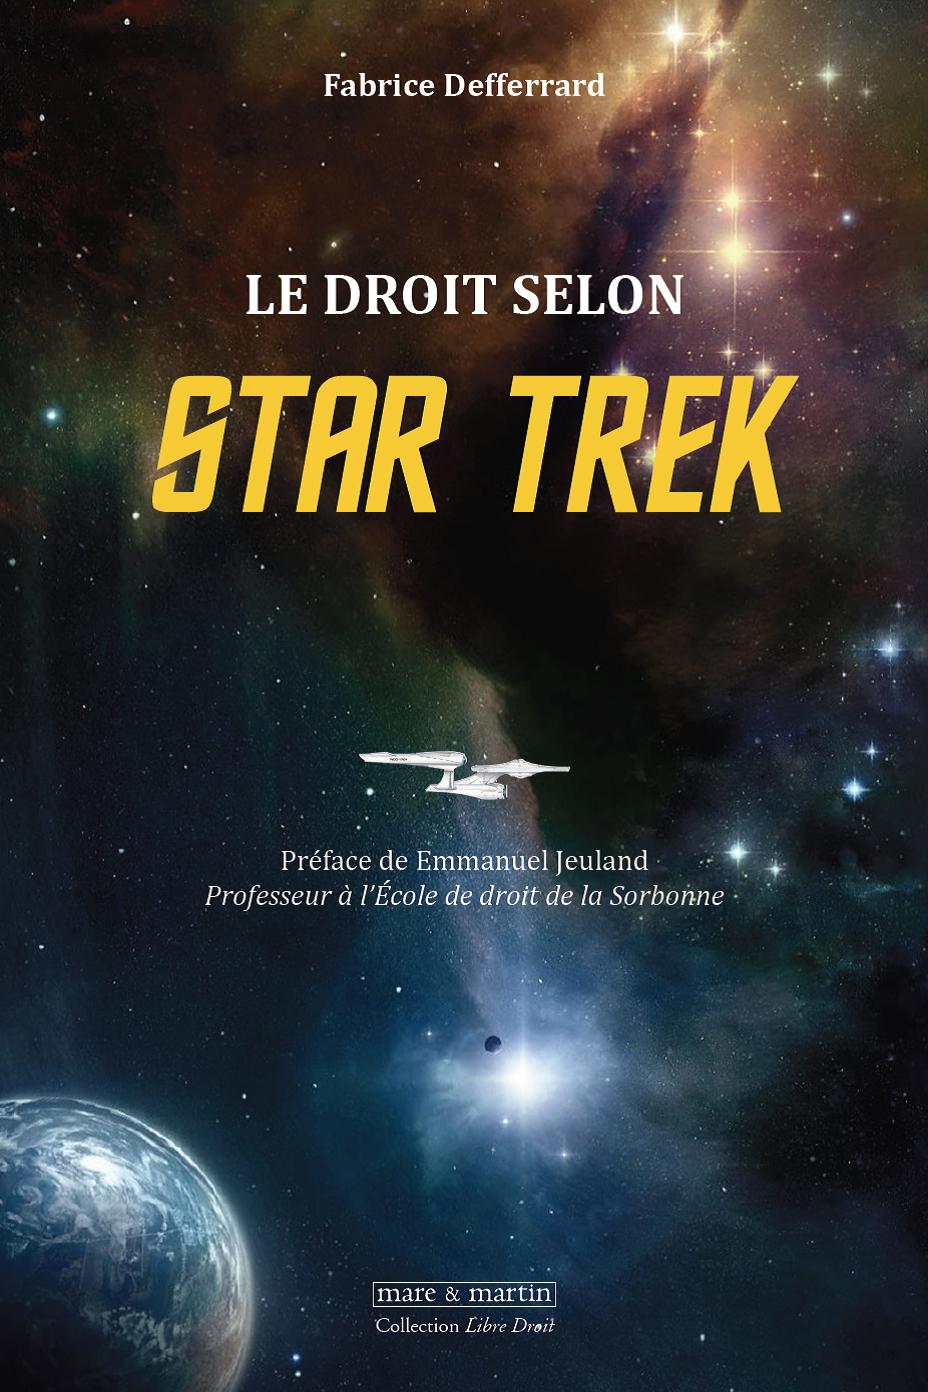 Le droit selon STAR TREK, par Fabrice DEFFERRARD, préf. Emmanuel JEULAND, éd. mare & martin.